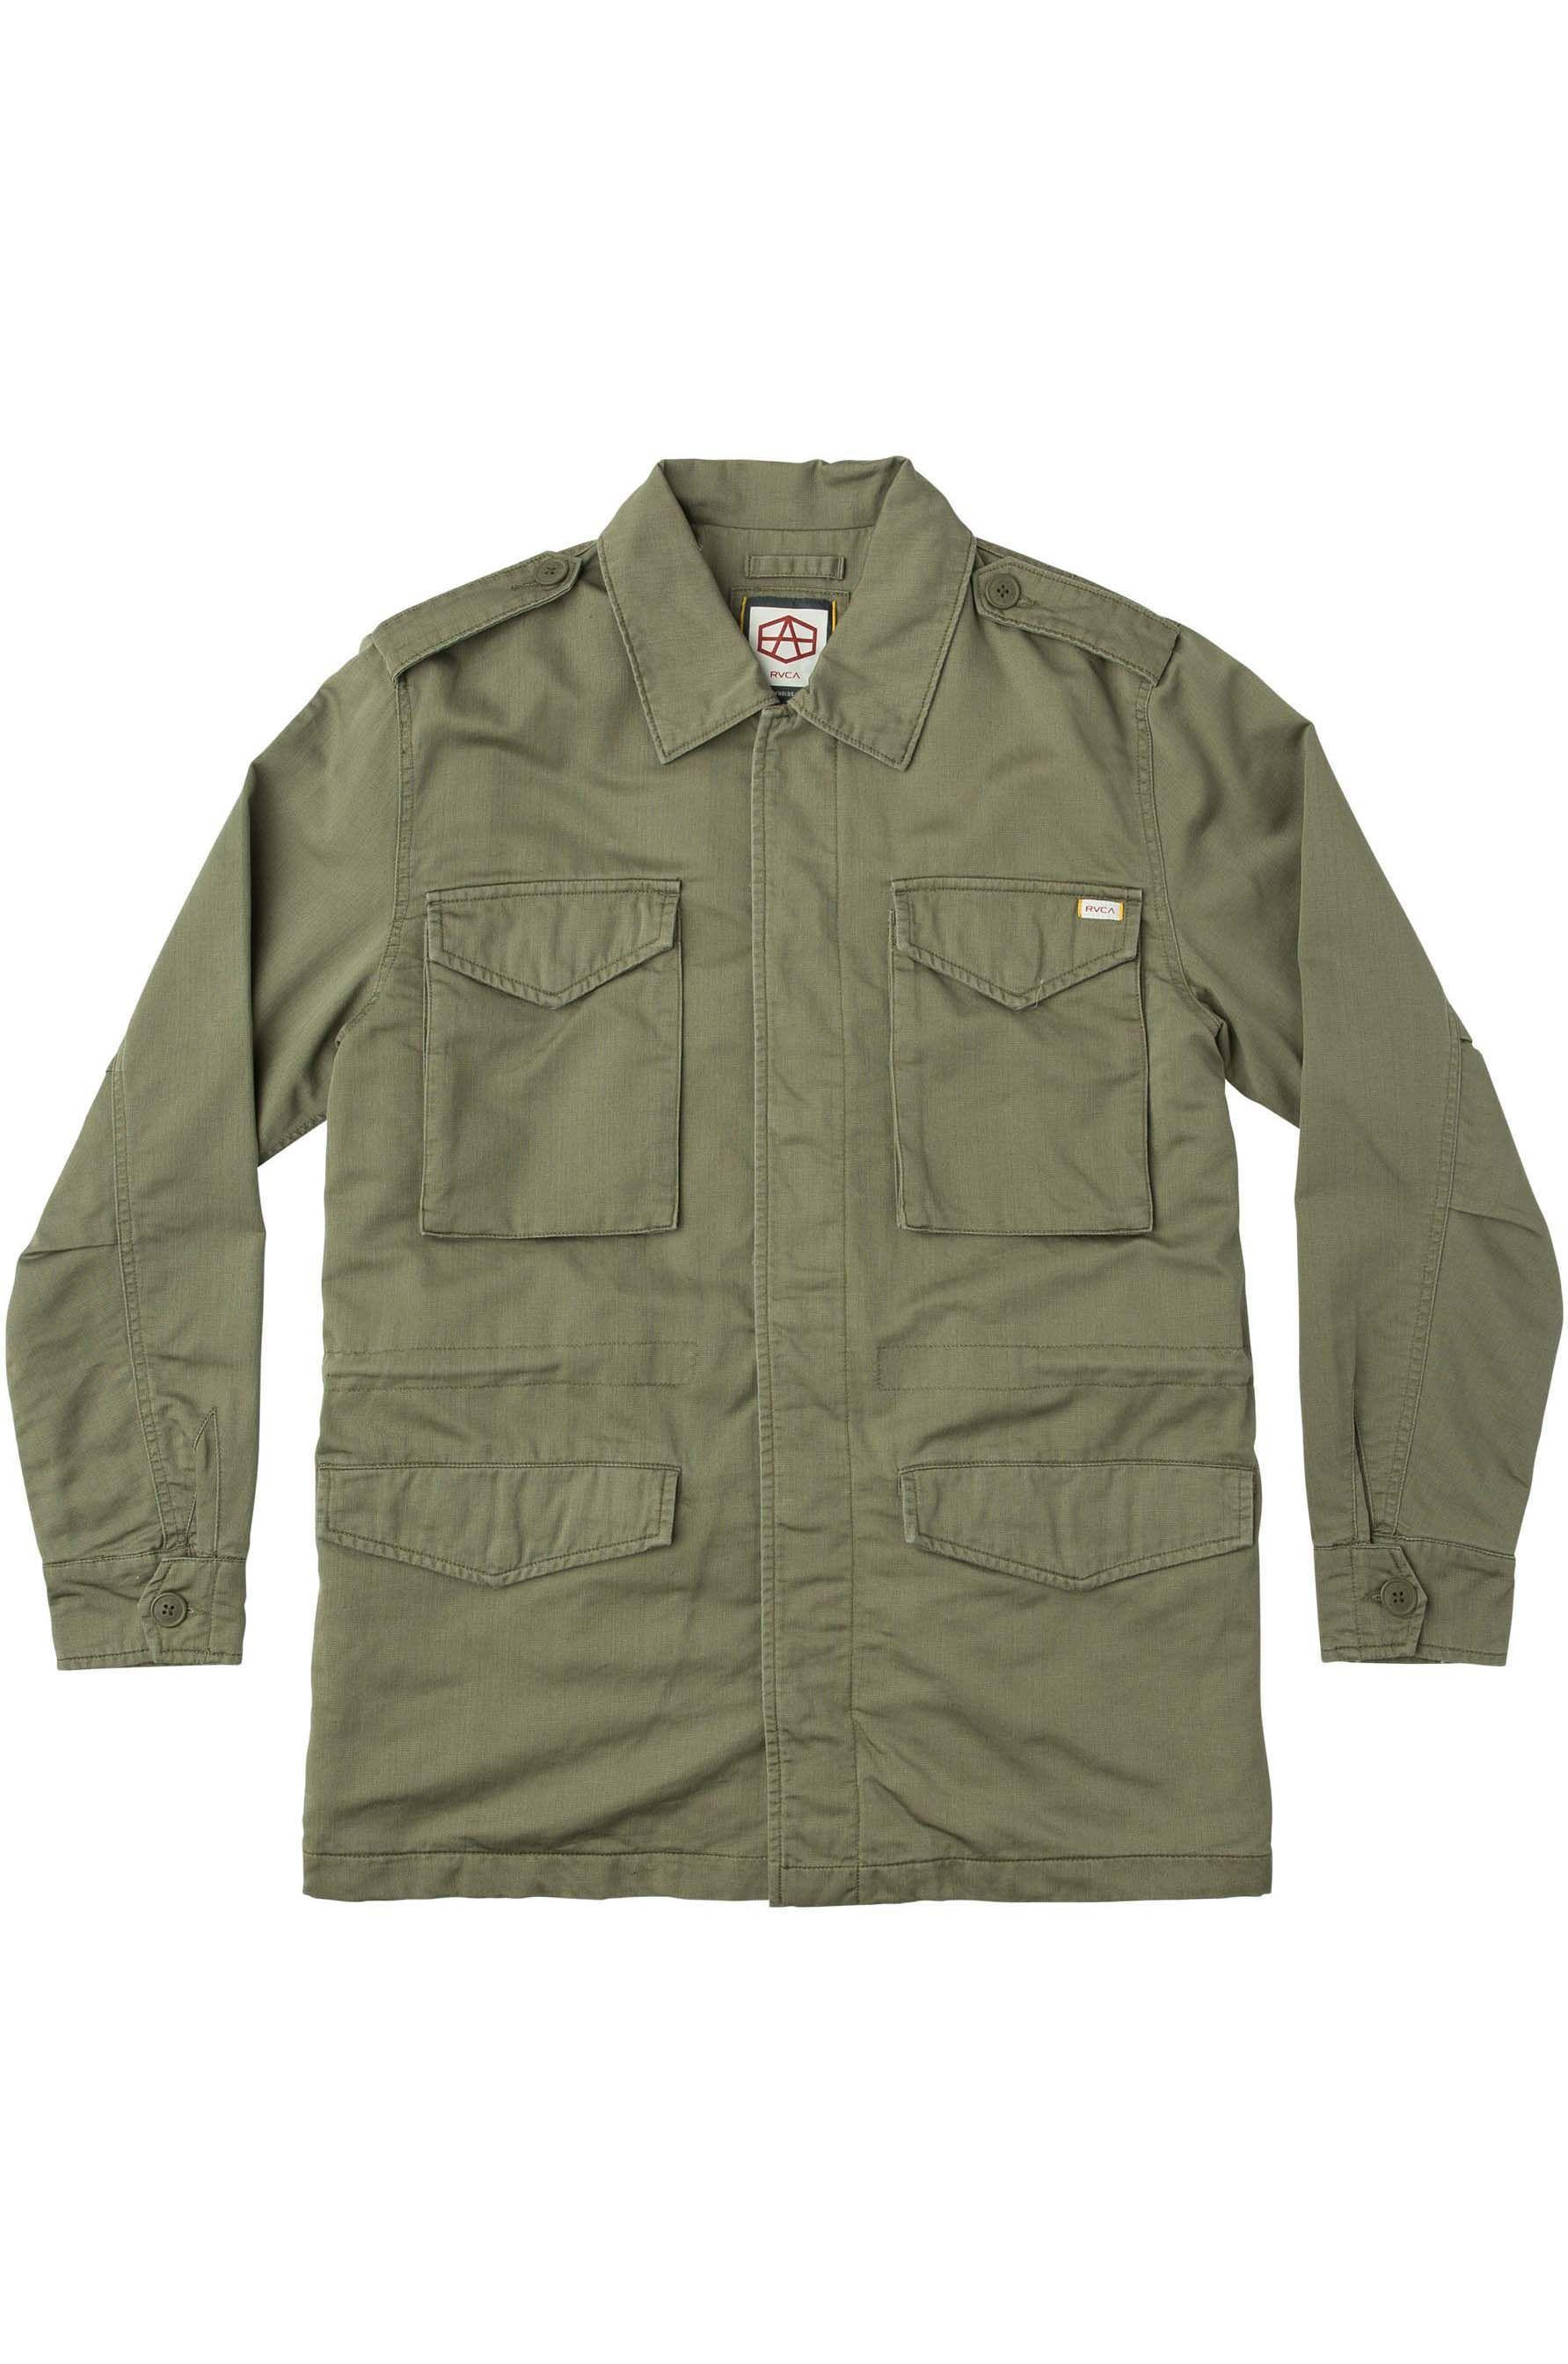 Blusão RVCA ANDREW REYNOLDS M65 Olive